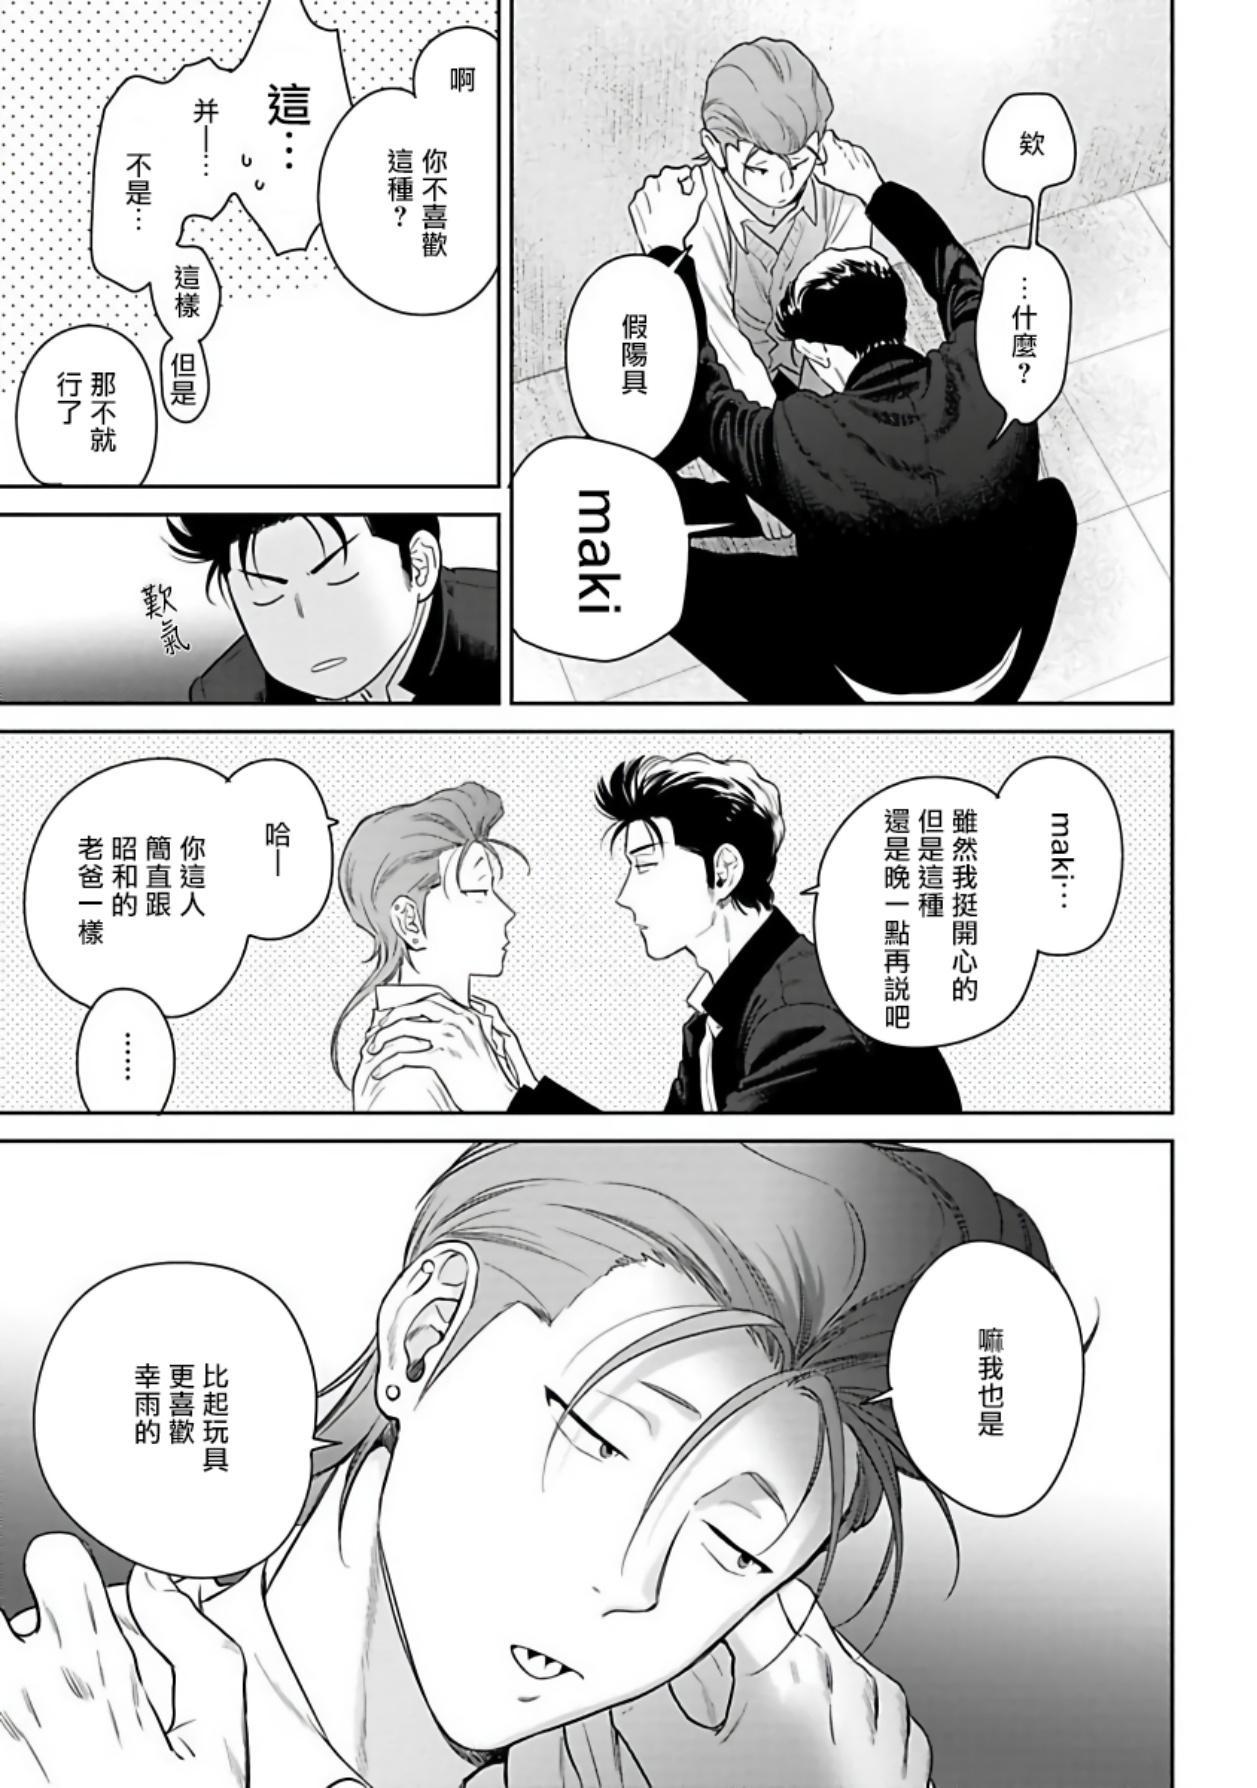 Nakasete Yaru yo Yankee-kun   让你哭噢小混混 番外 3